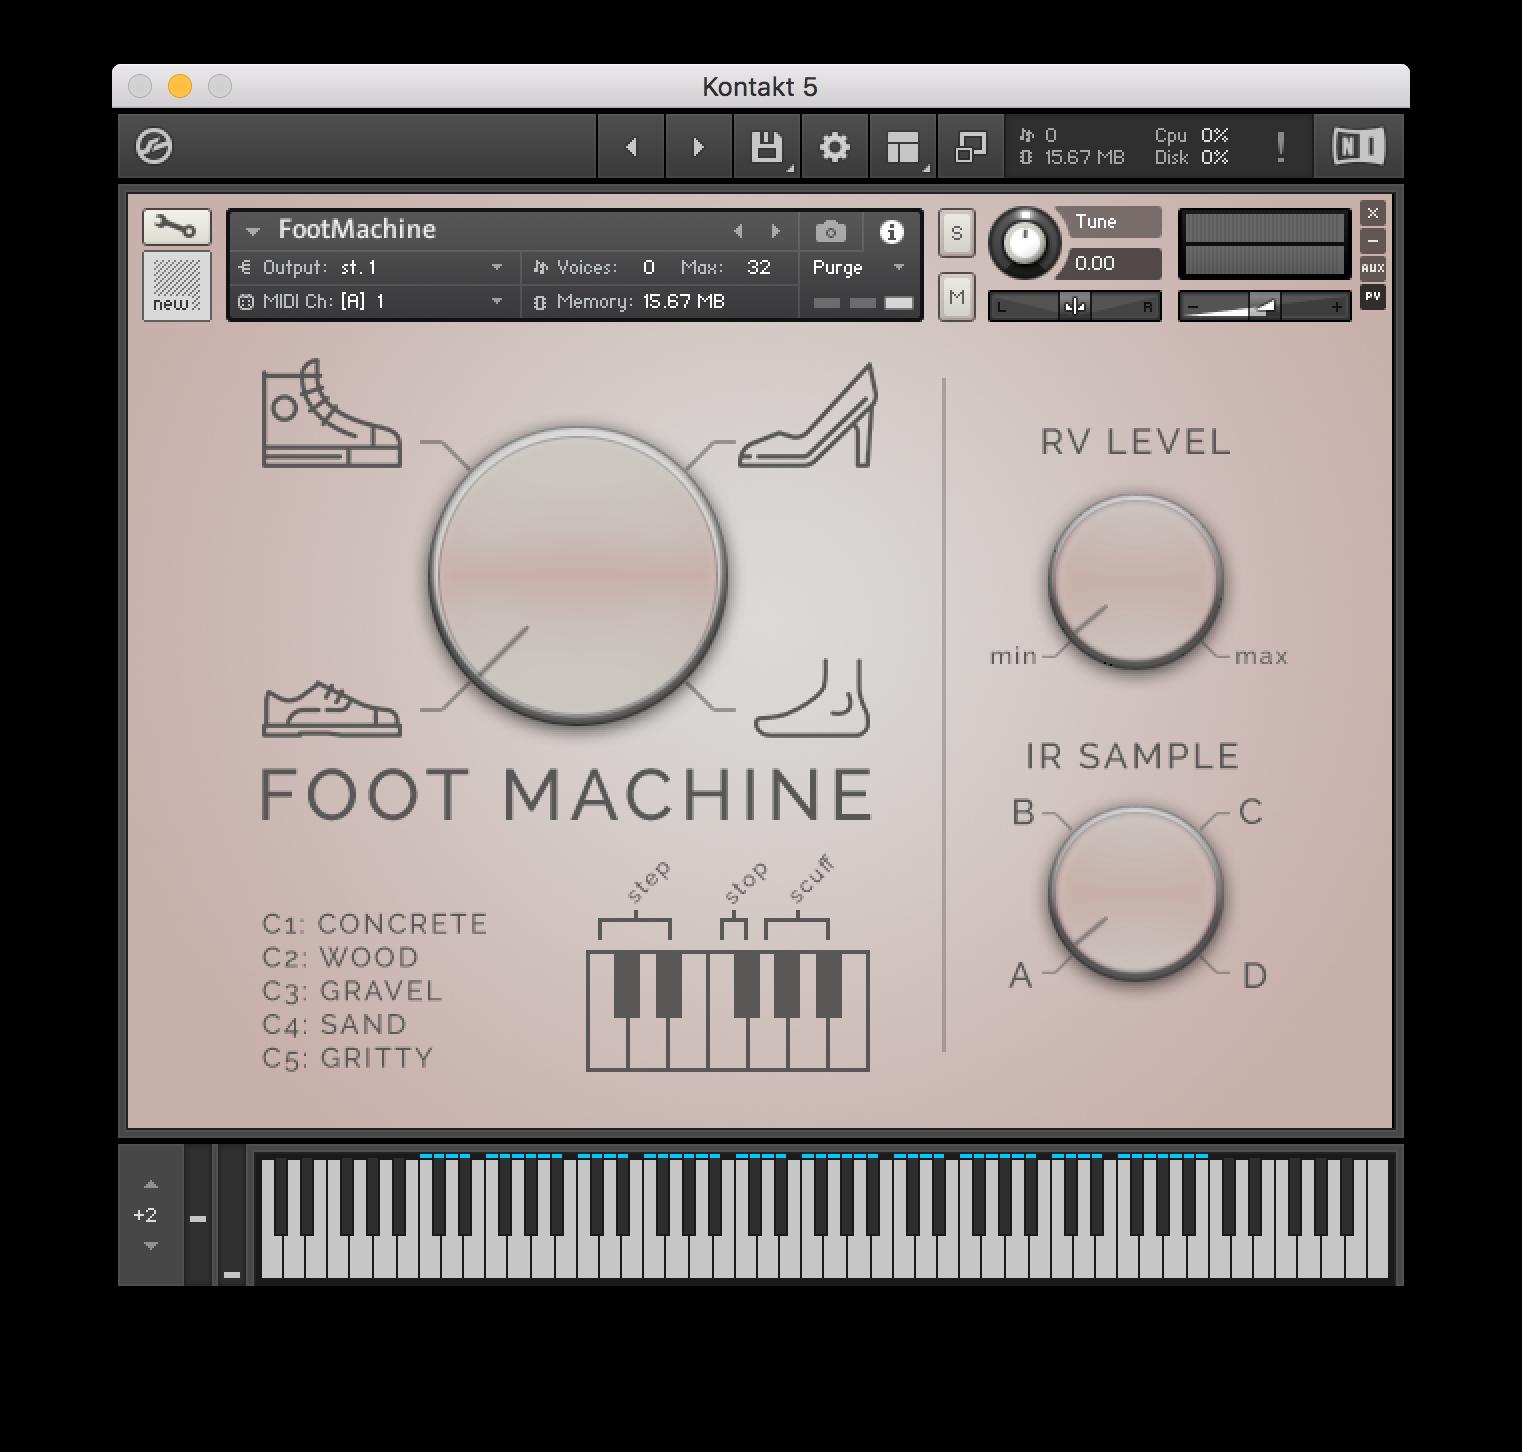 UI of Foot Machine, the footsteps Kontakt instrument